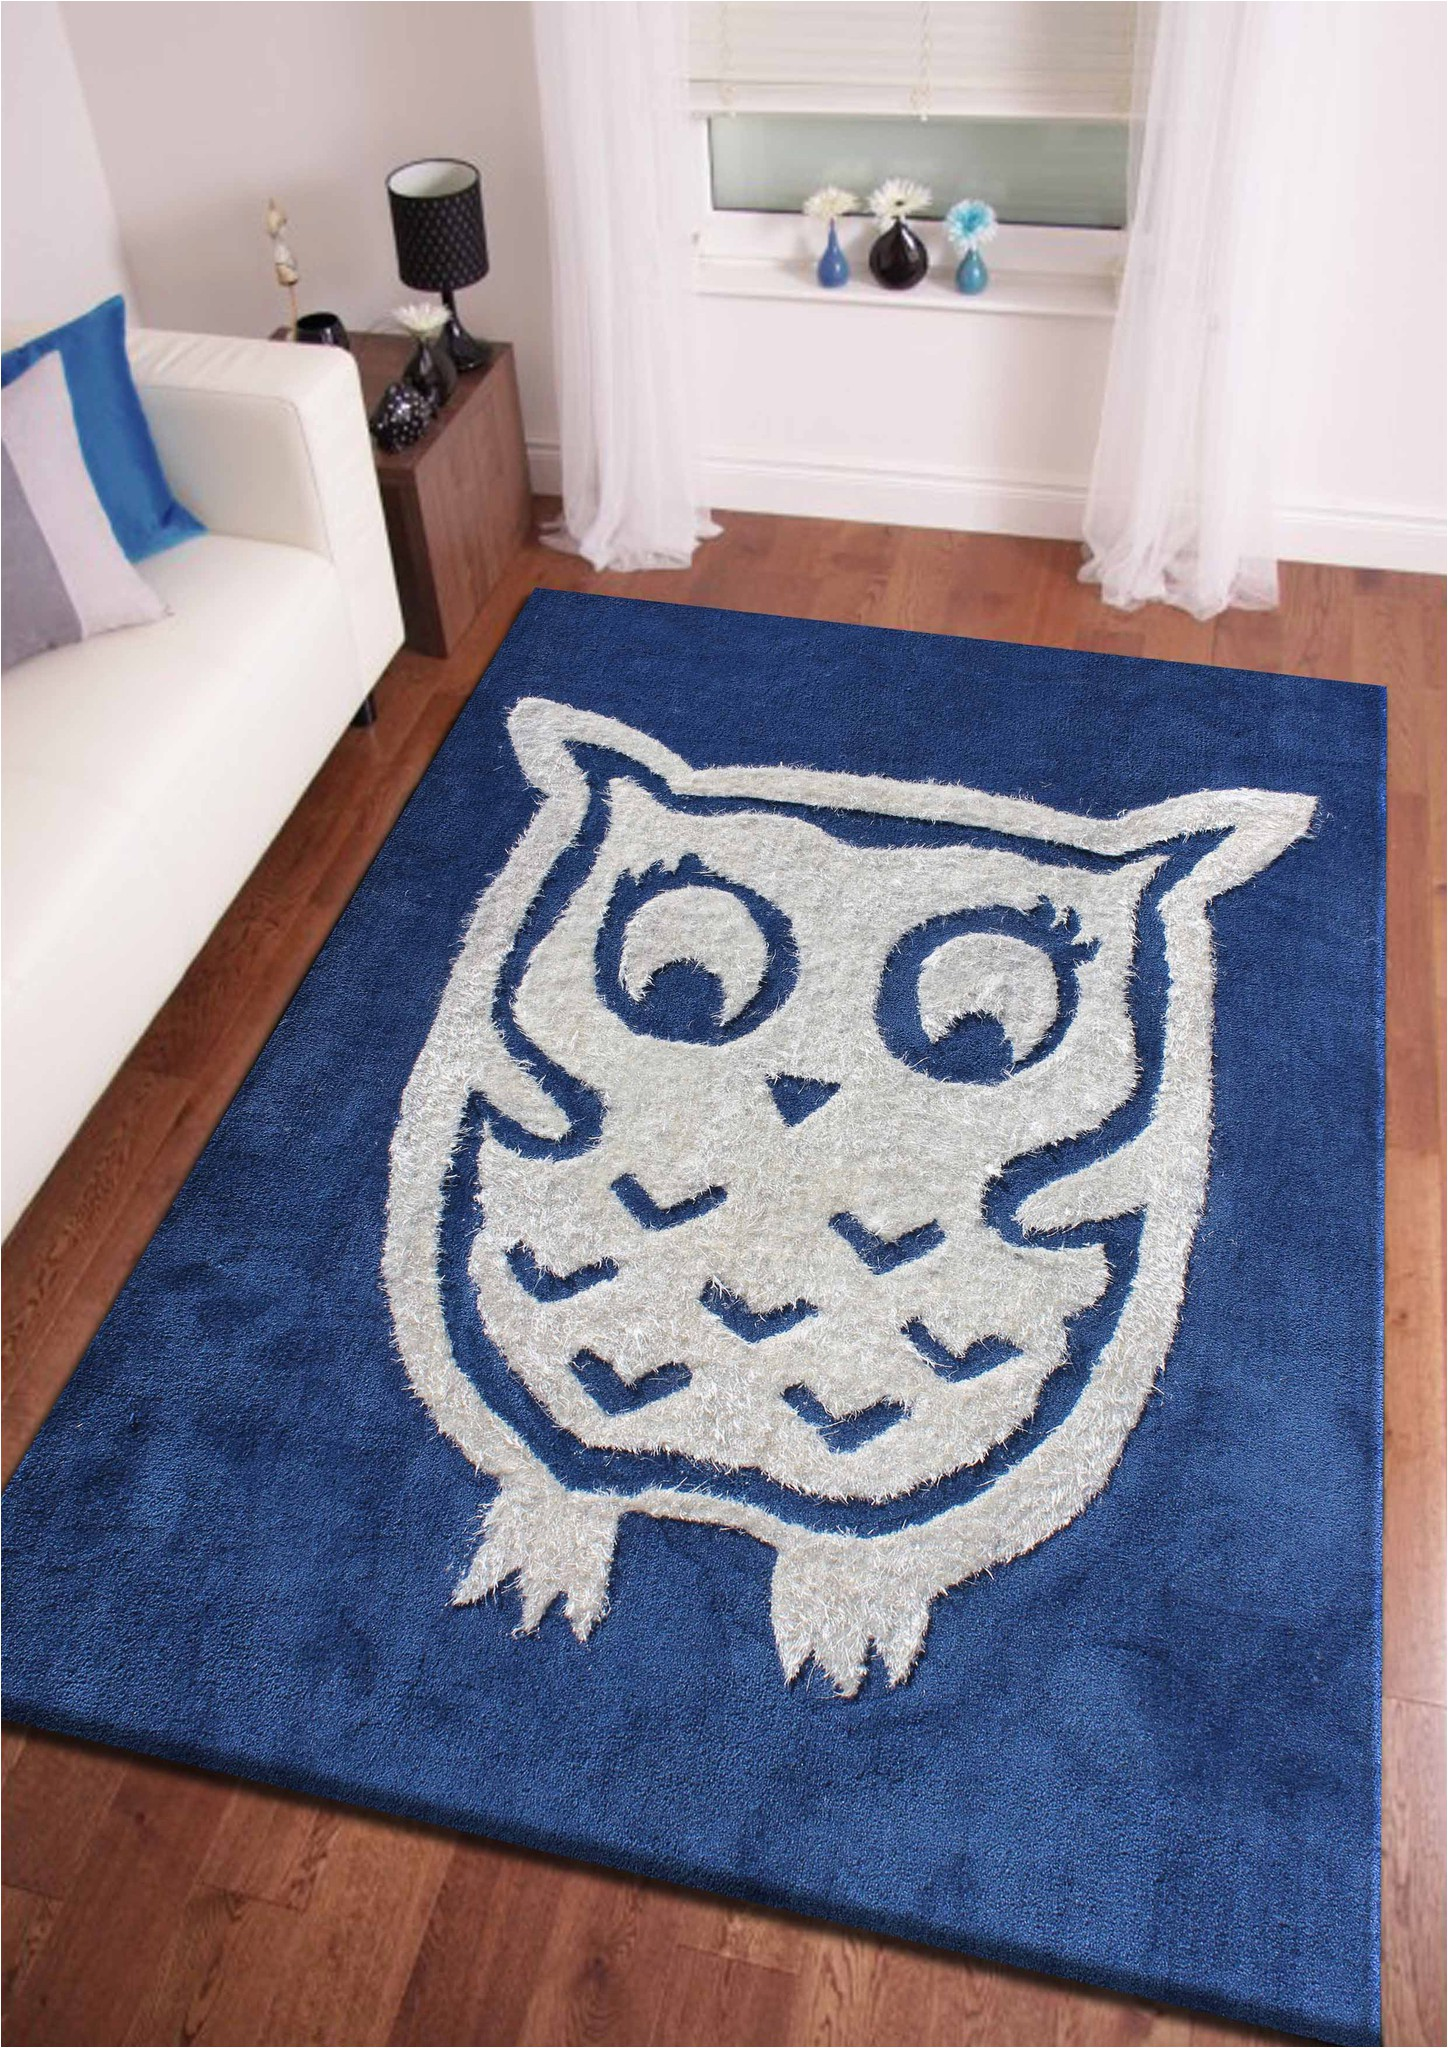 Bathroom Rugs Home Depot Rugs Cute Interior Floor Decor Ideas with soft 4x6 Rug